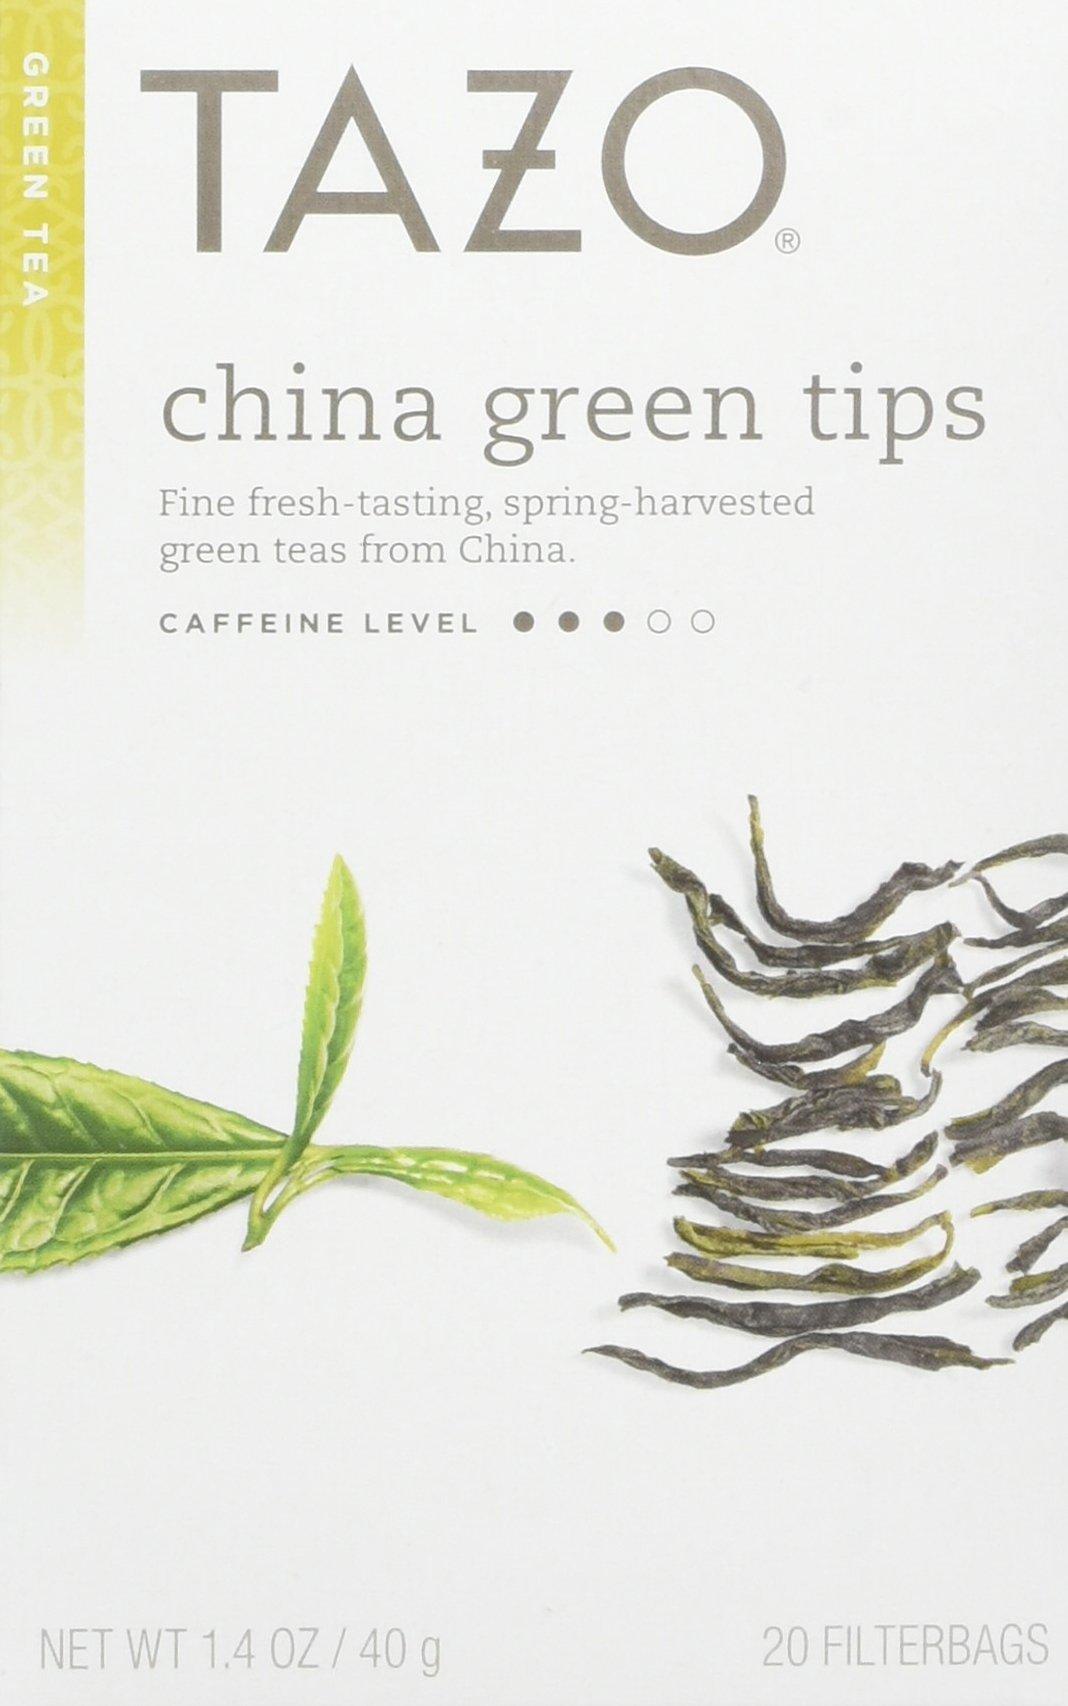 Tazo China Green Tips Green Tea, 20 Count (Pack of 6) by TAZO